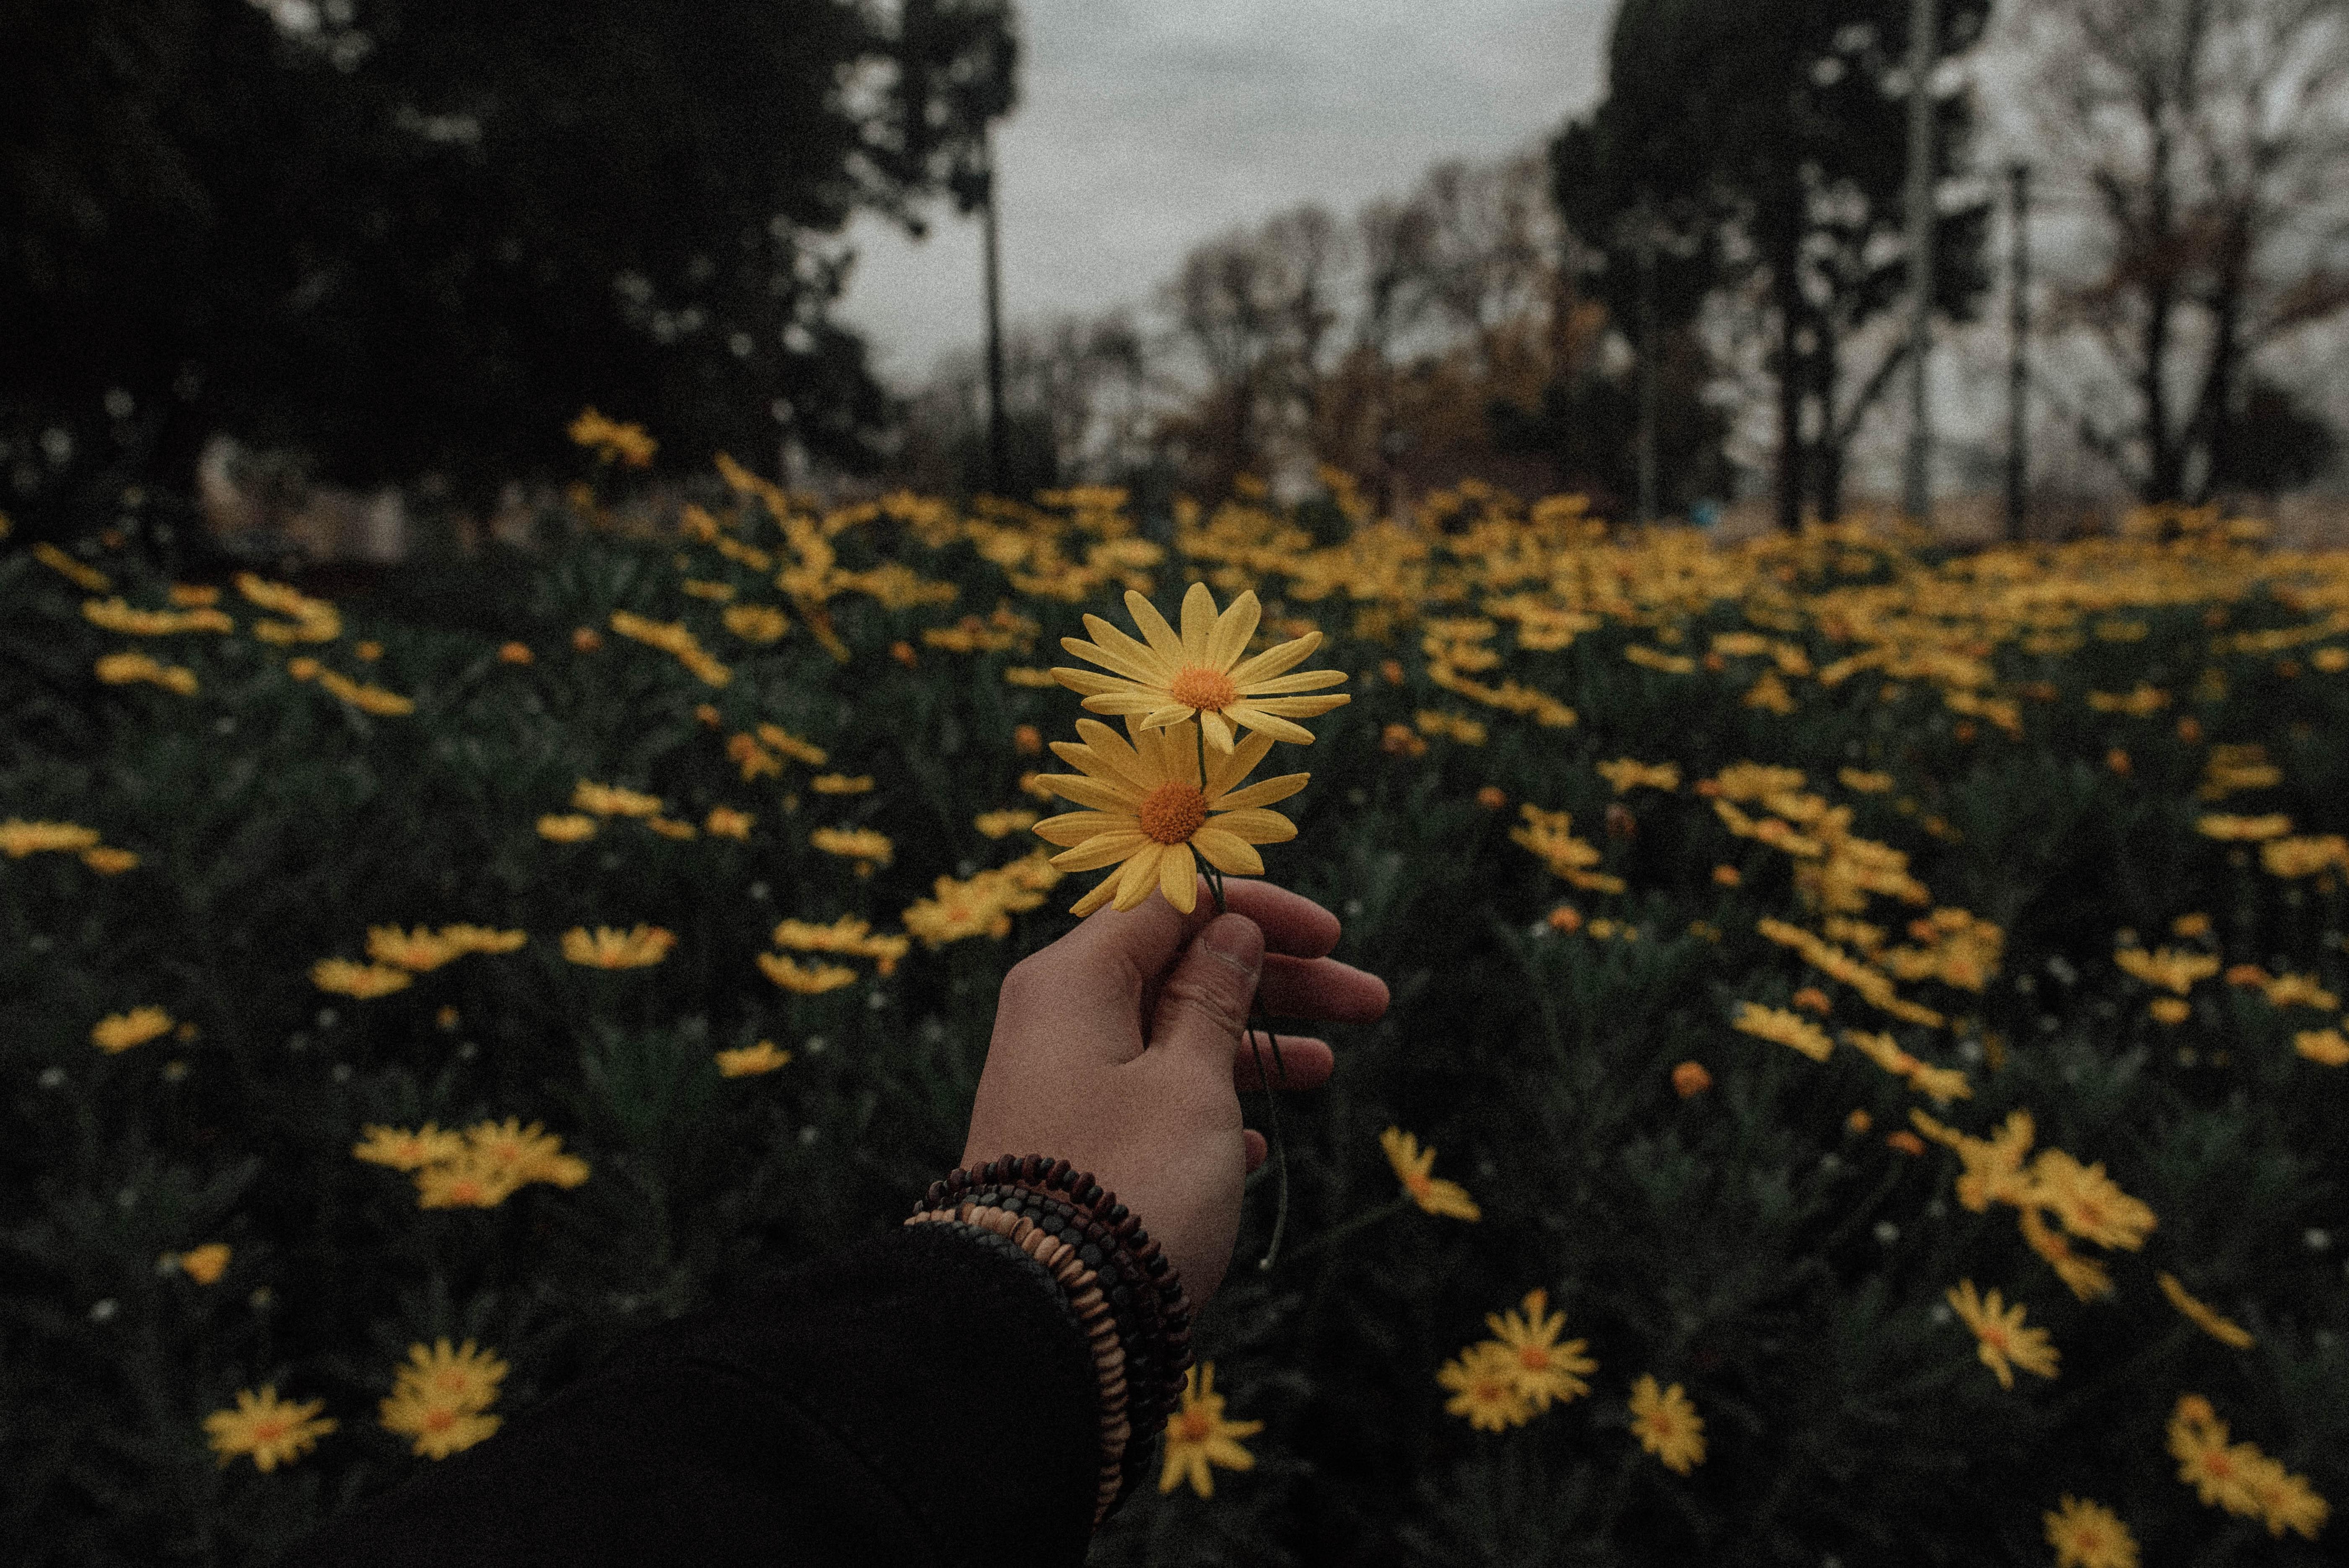 Aesthetic Wallpaper Laptop Sunflowers Download Aesthetic